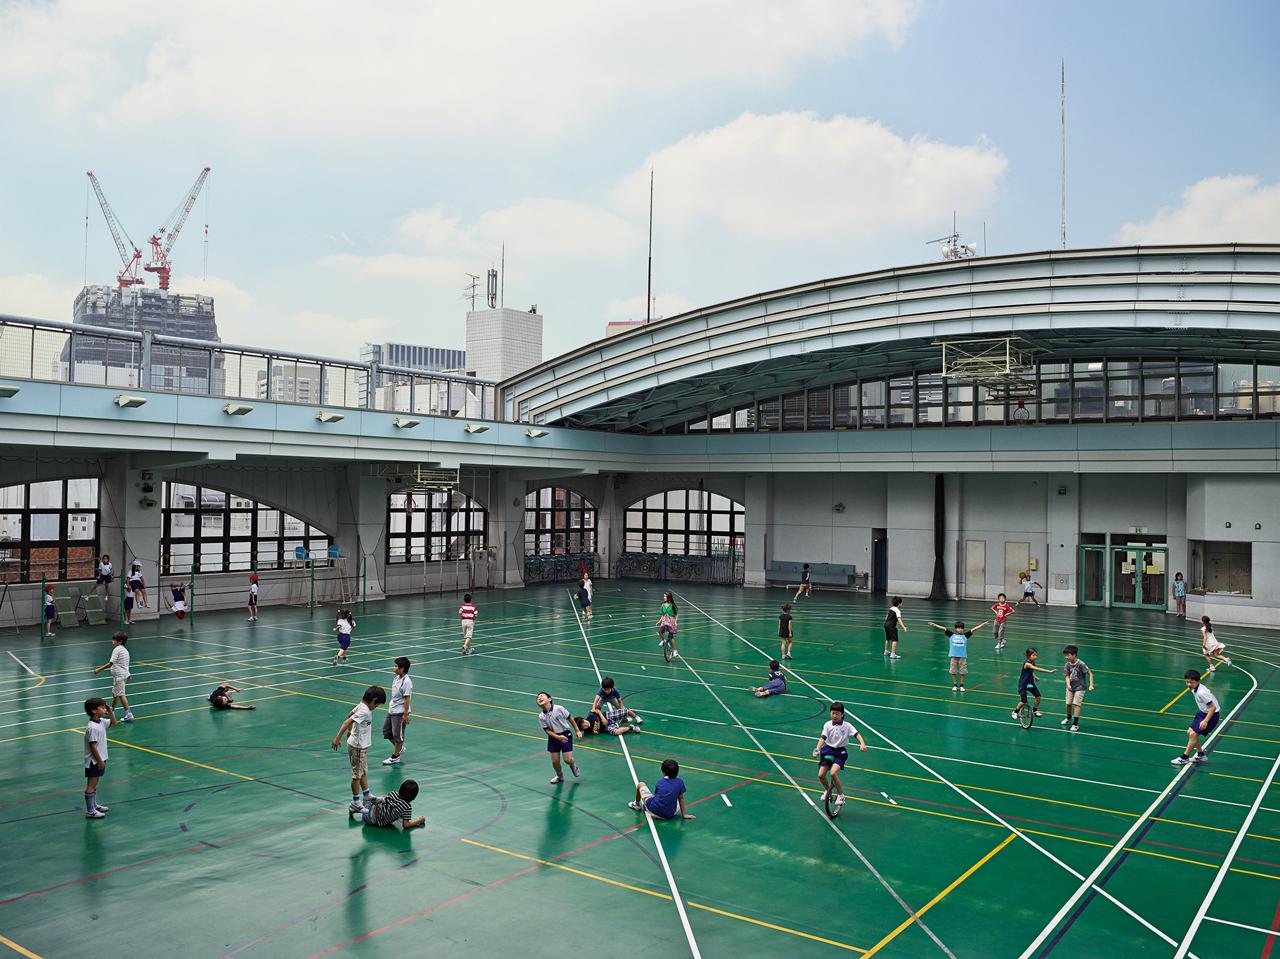 JAMES MOLLISON Shohei Elementary School, Tokyo, Japan, September 8, 2011